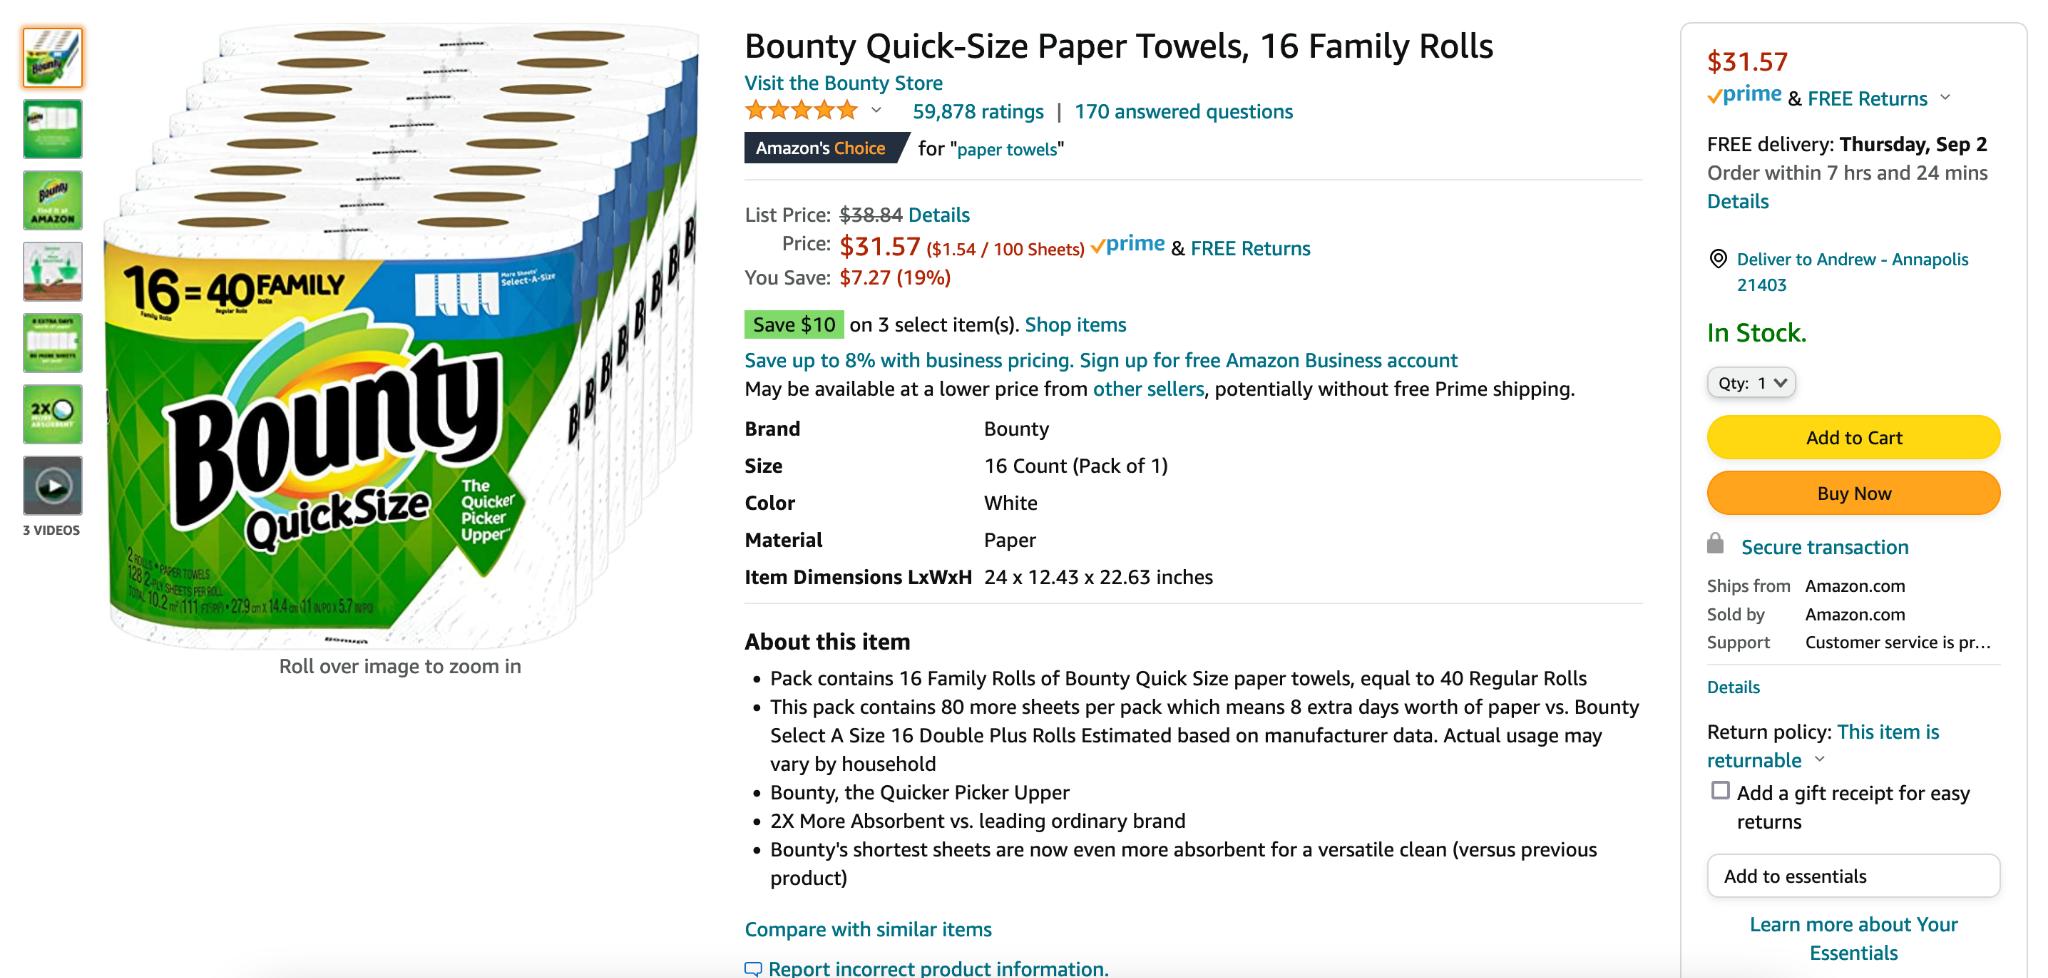 Bounty bundle discounts